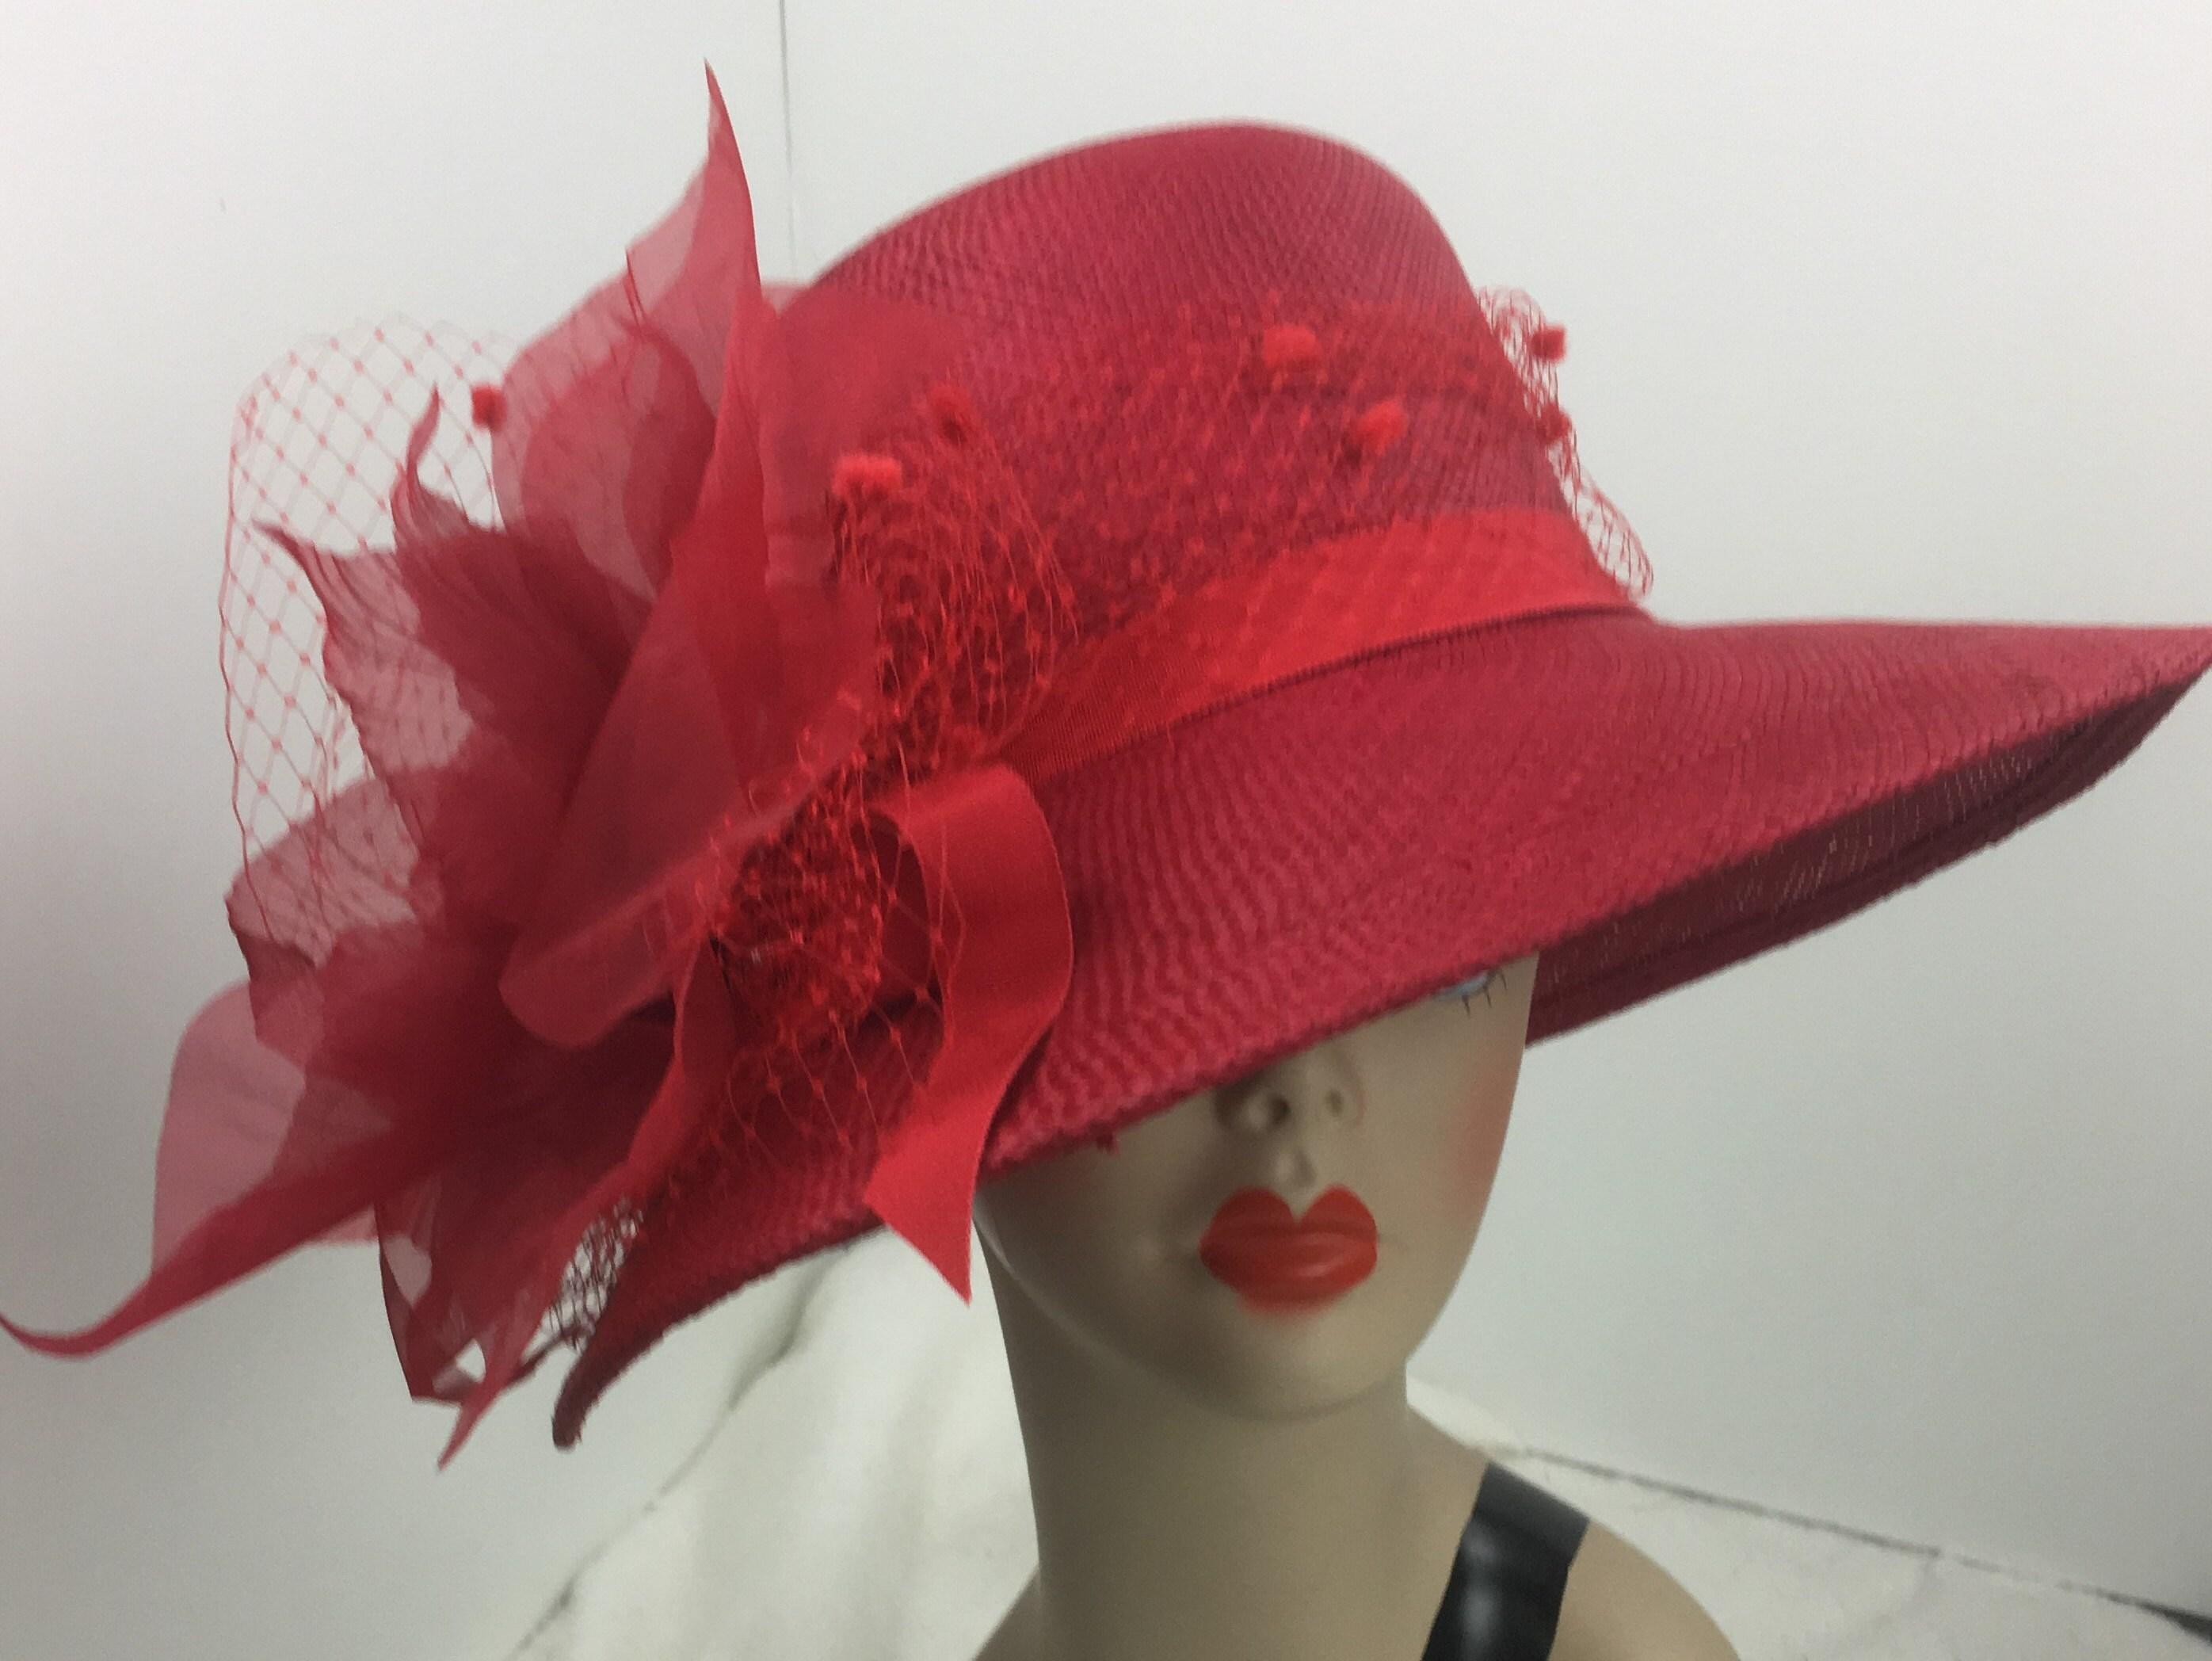 c9018cc7c Handwoven Panama Straw Hat Woman's Red Wide Brim Dressy Formal ...